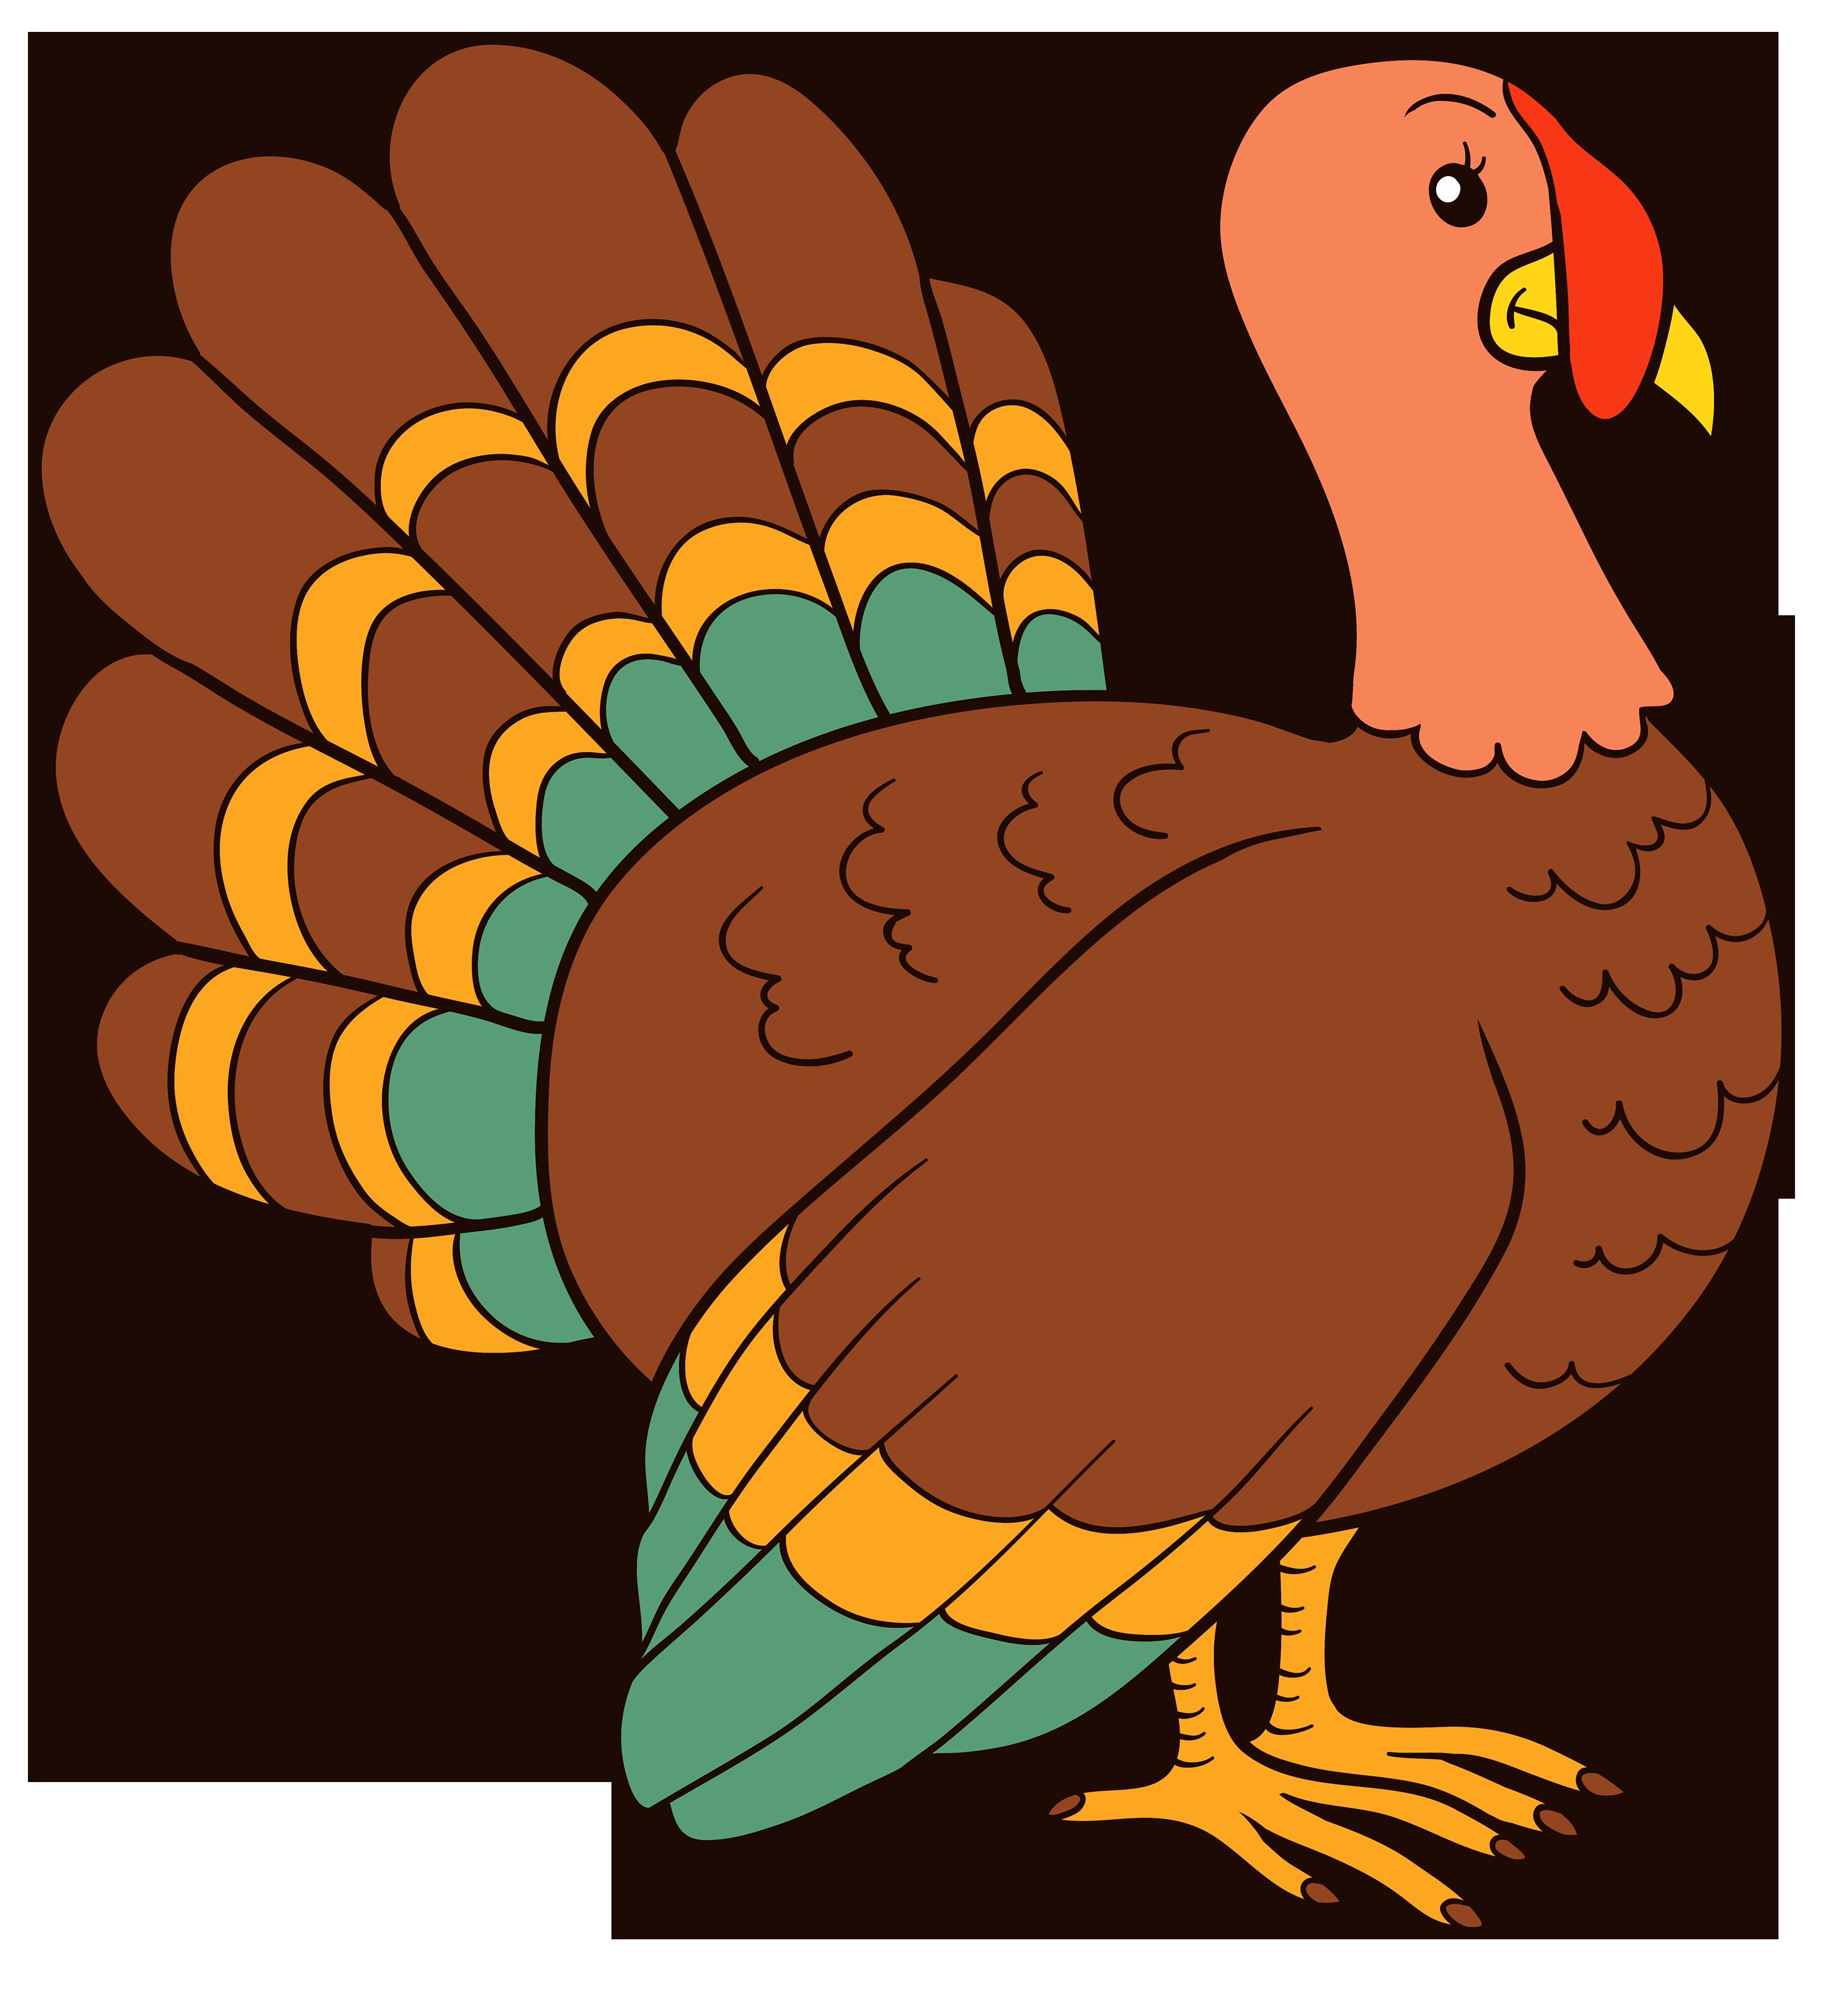 ... Turkey clip art - Vergilis Clipart ...